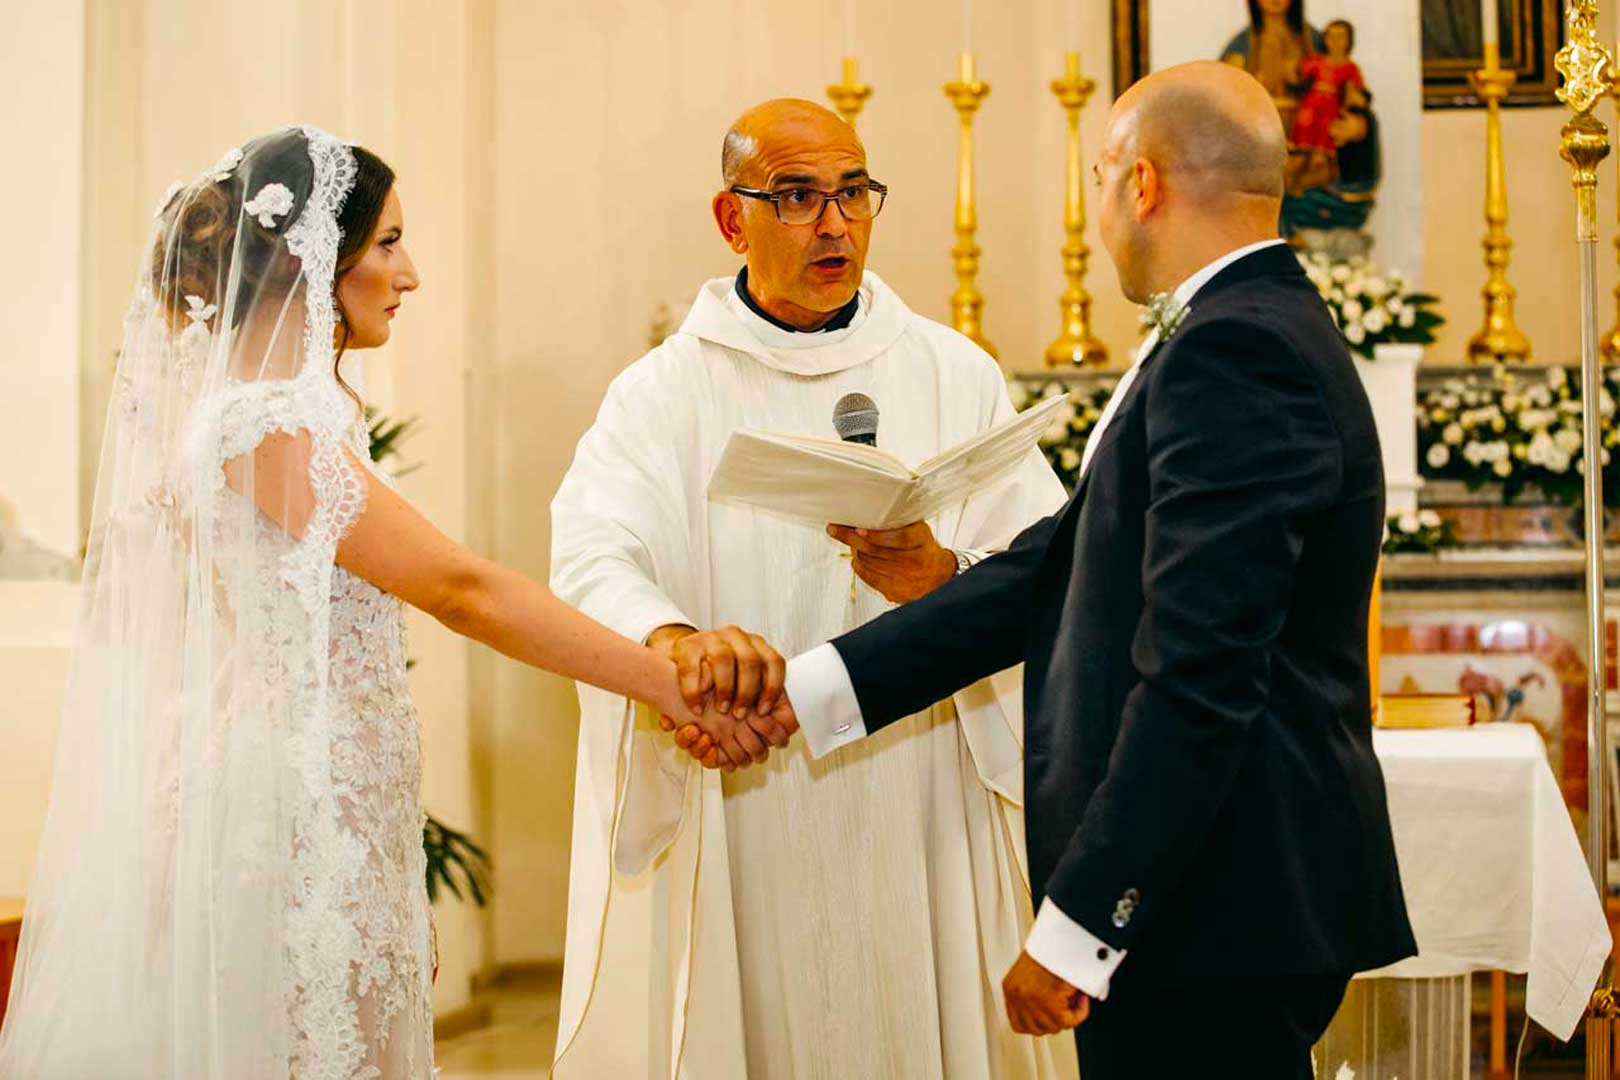 018-matrimonio-stornarella-gianni-lepore-fotografo-lucera